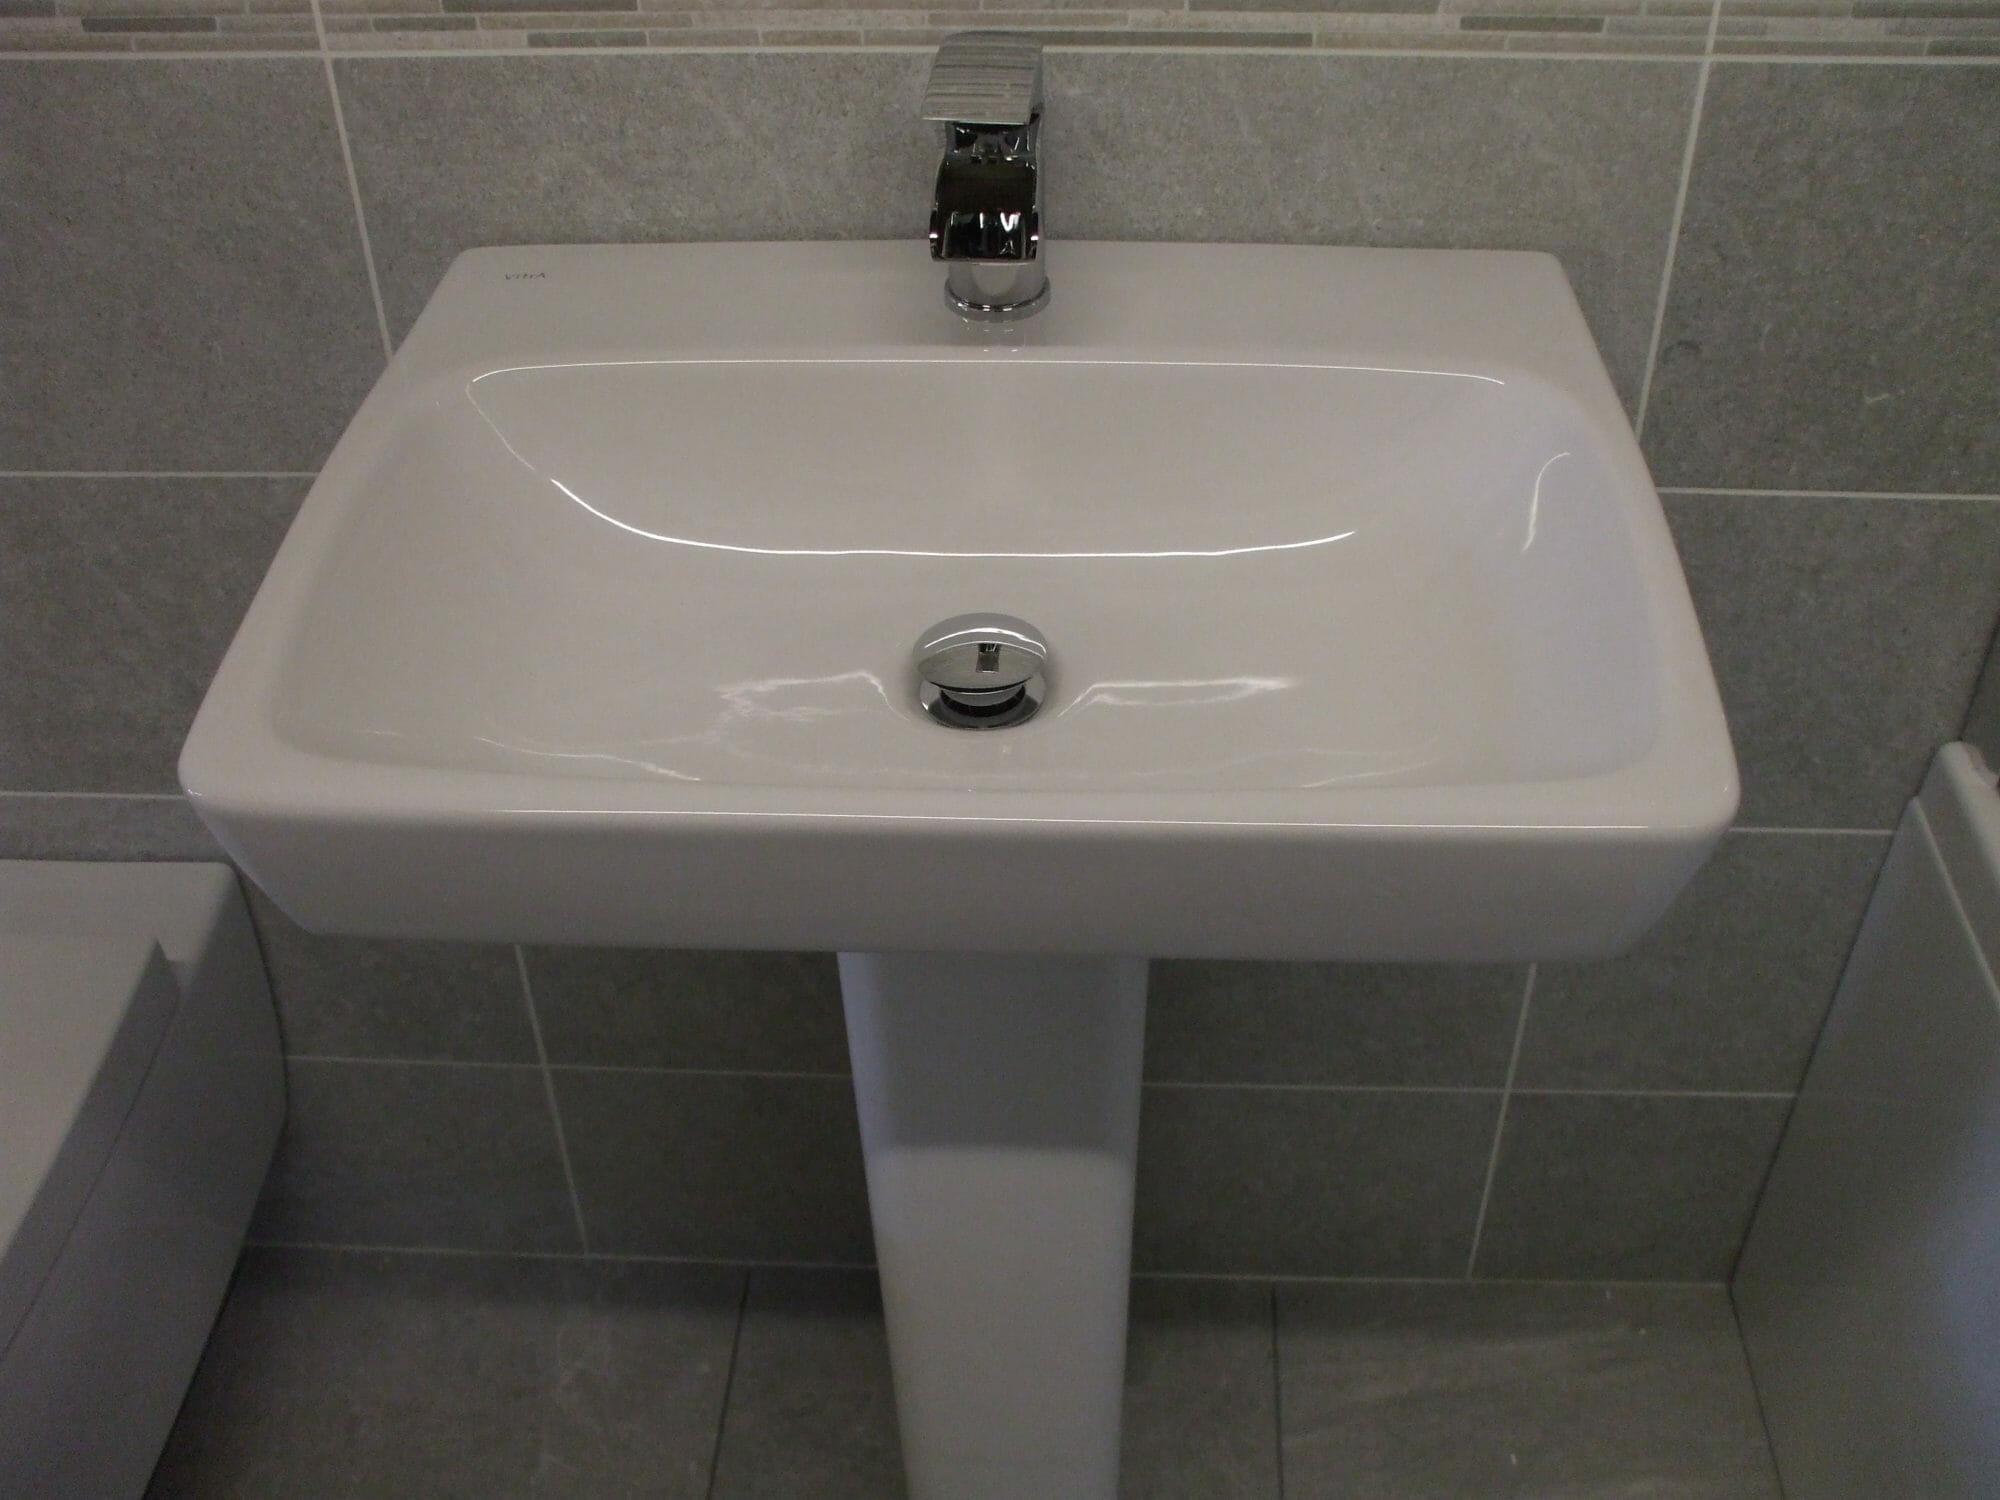 Vitra Sento 600mm Basin & Pedestal